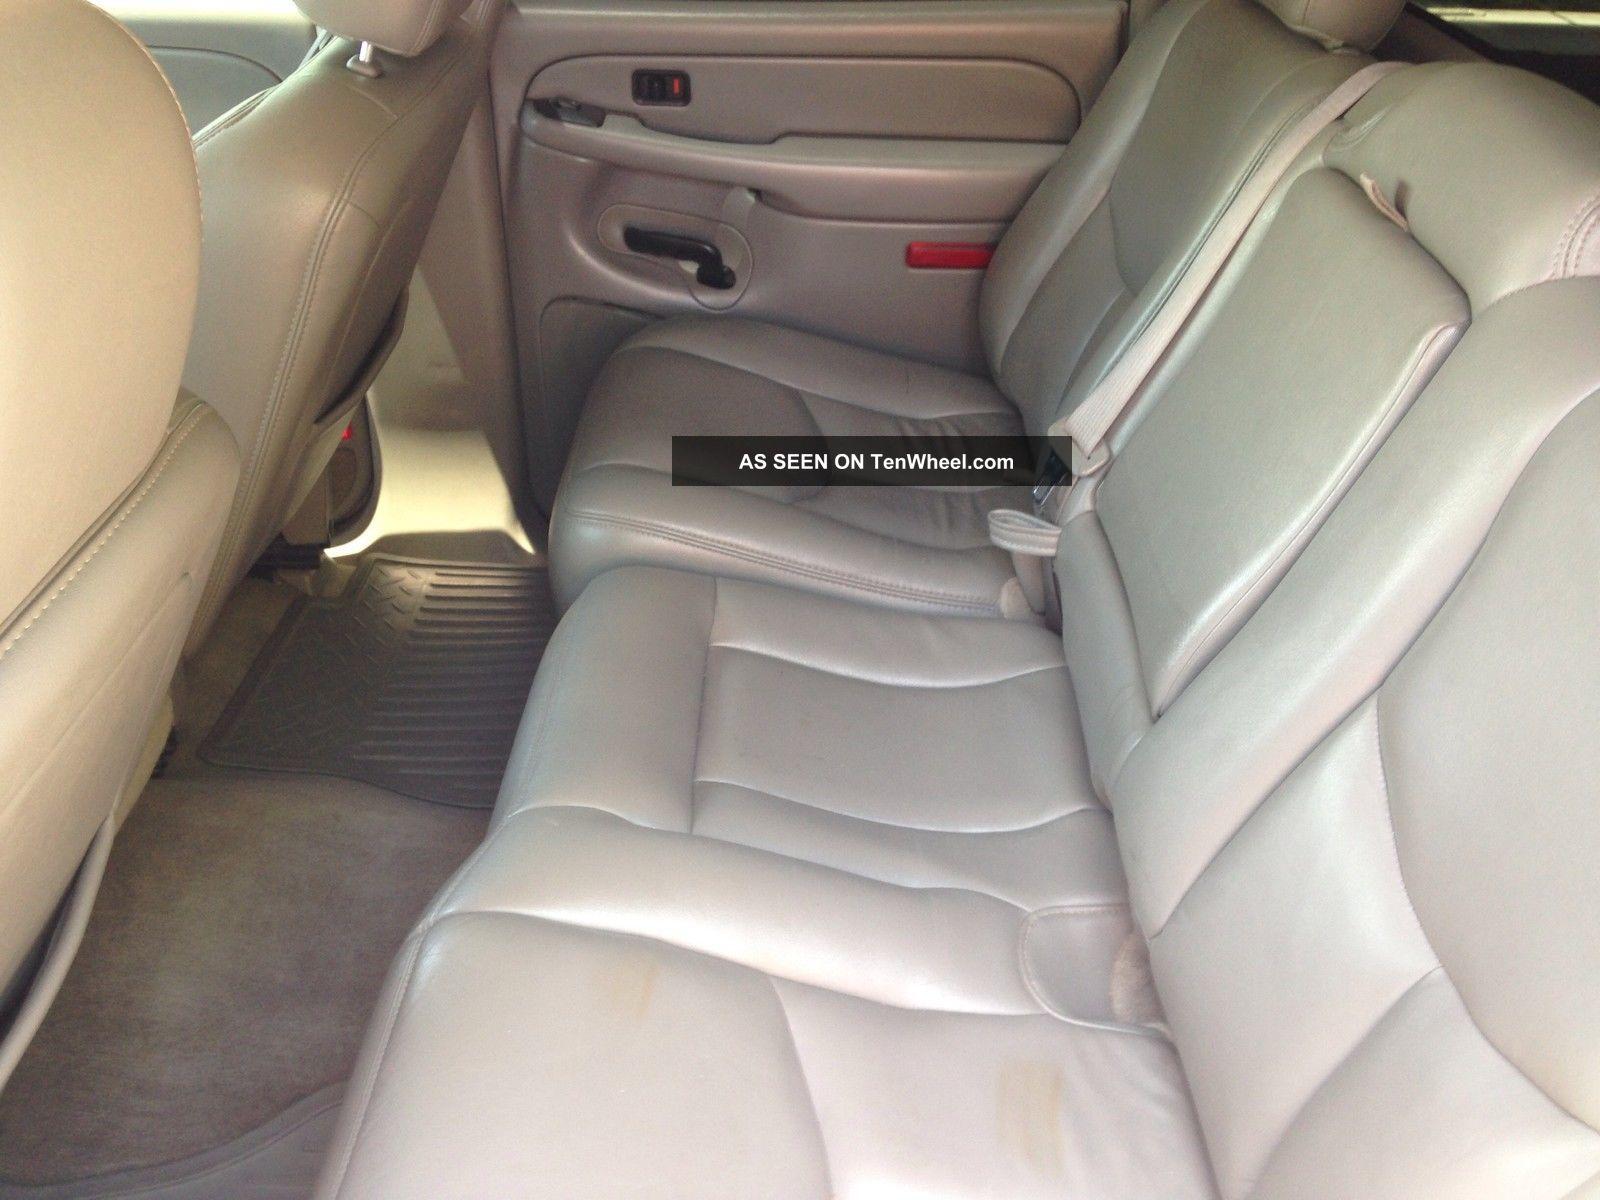 2014 Chevy 2500 Hd Crewcab.html   Autos Post